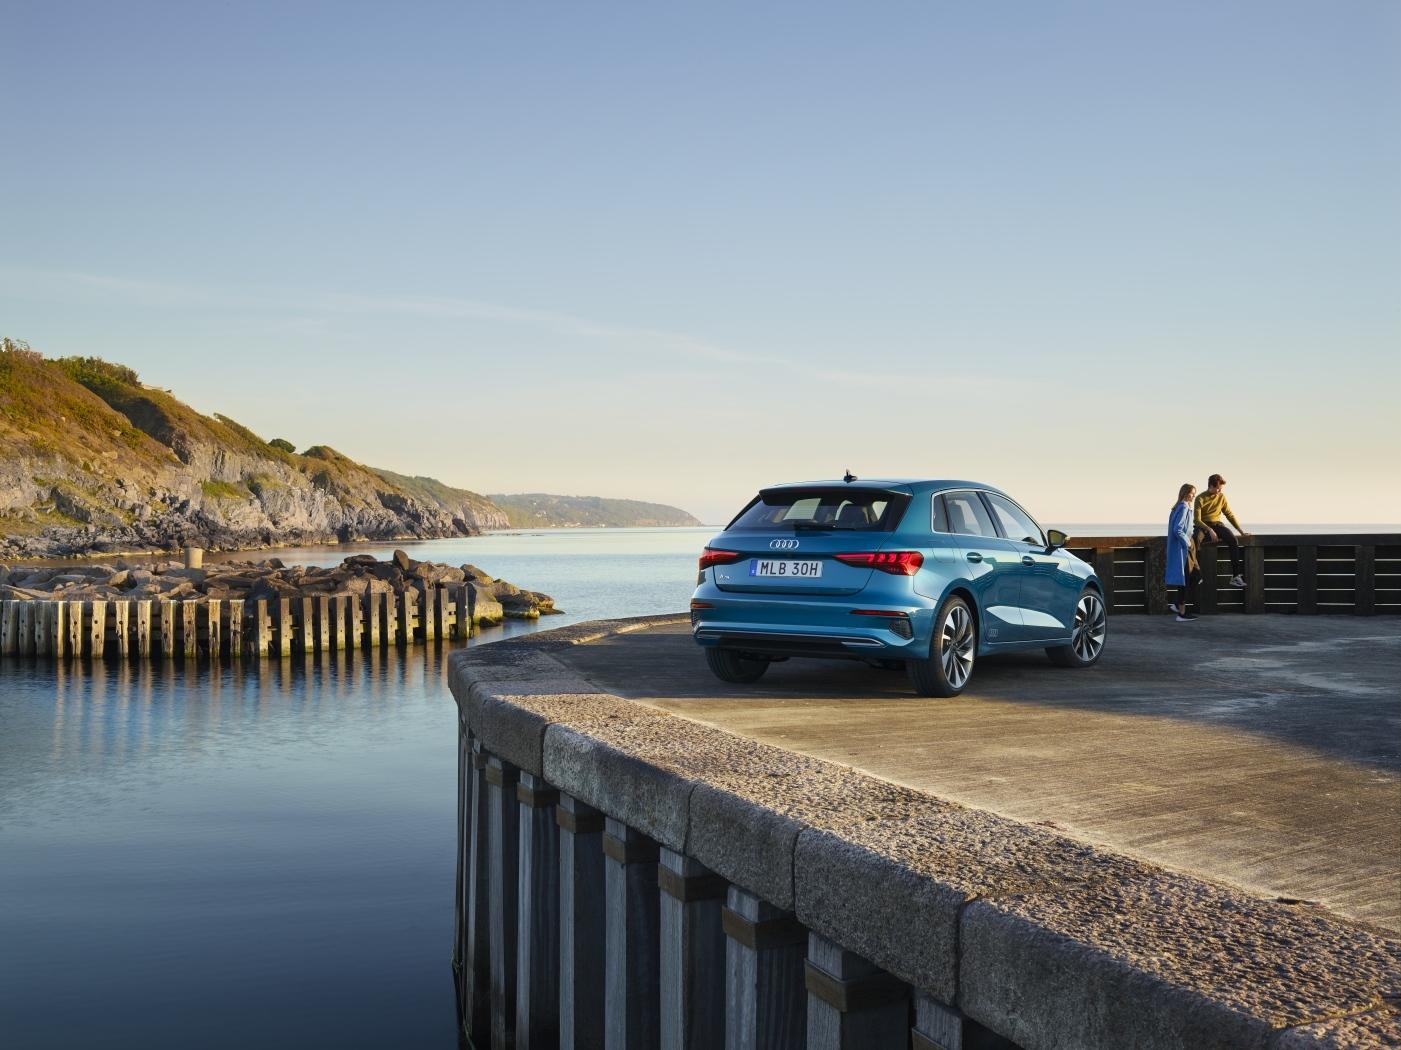 Privatleasa drömmen idag. Audi A3 Sportback.